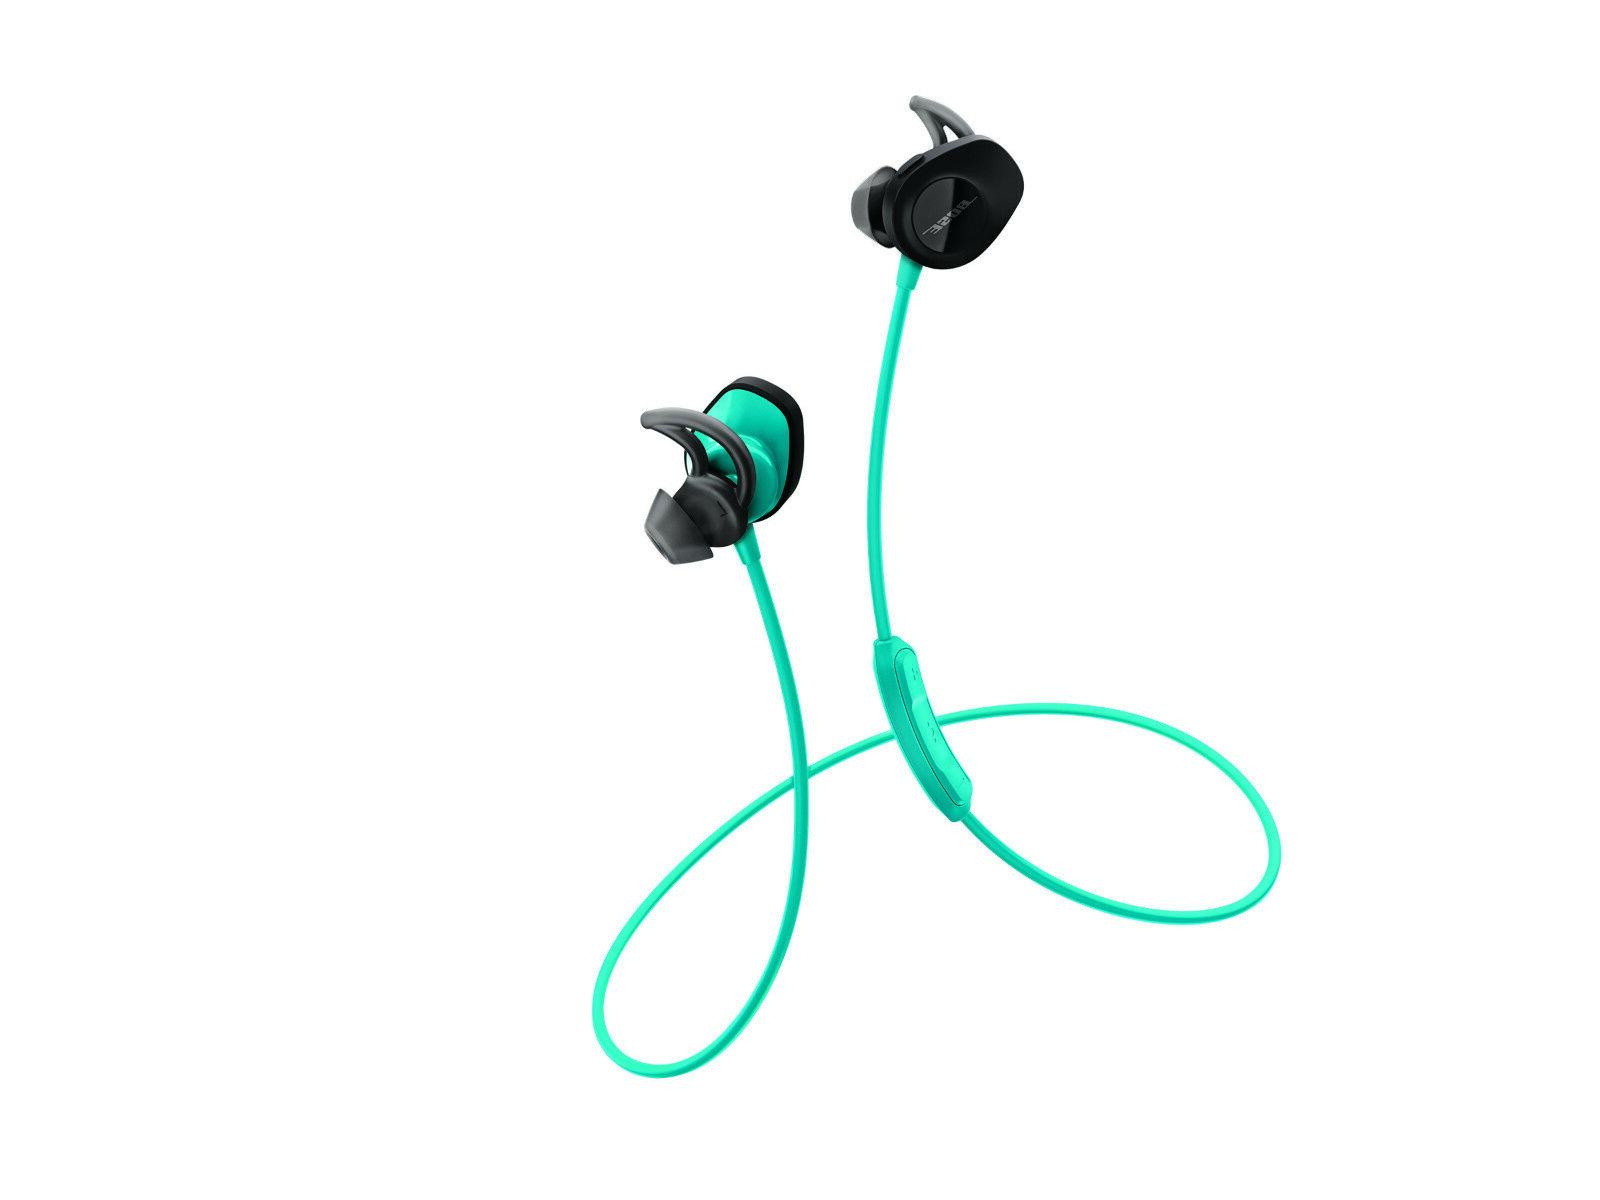 Bose Soundsport Bluetooth Wireless Earbuds, Sweat